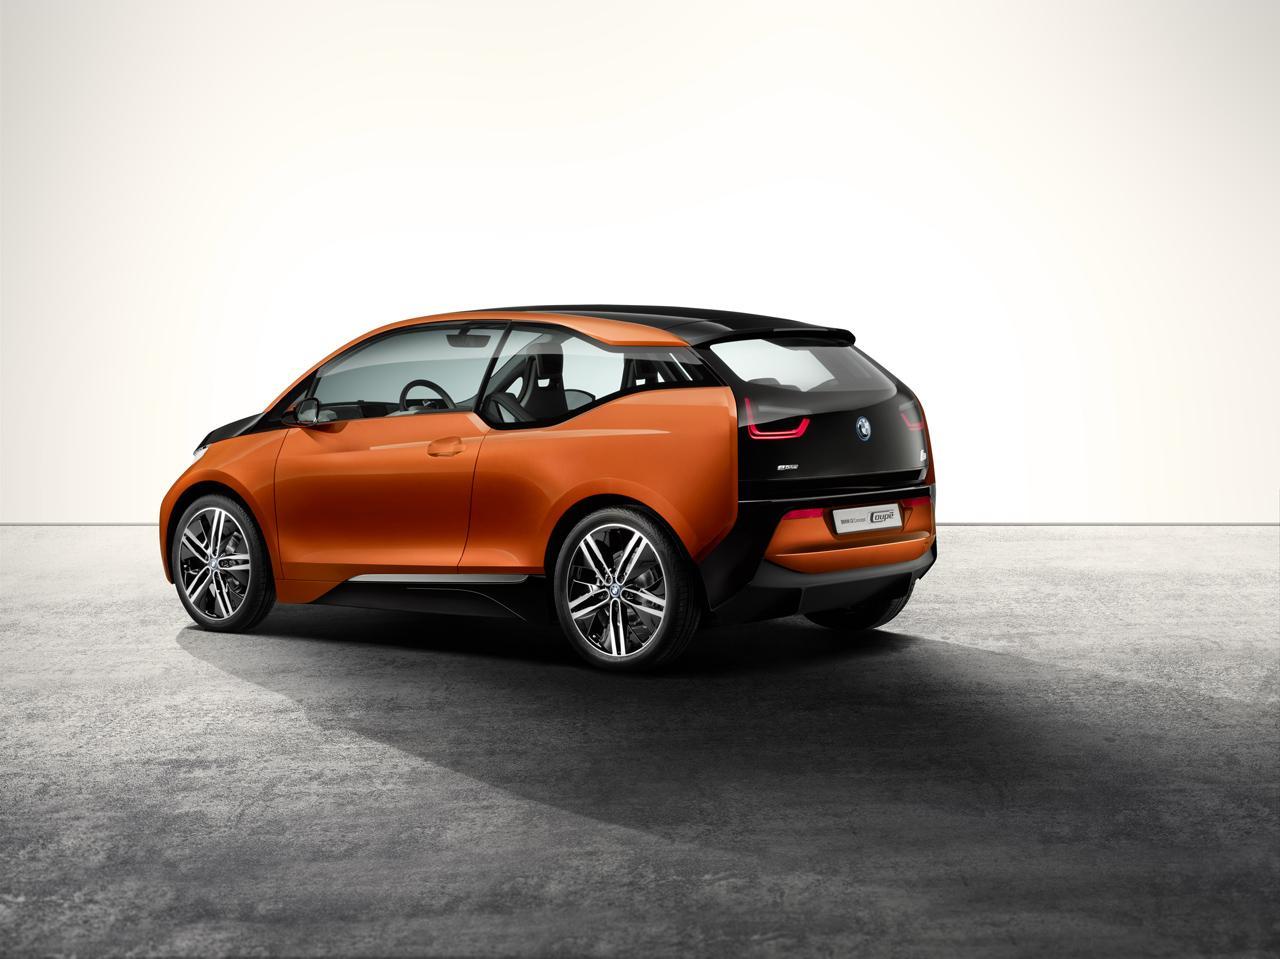 [Resim: BMW+i3+Coup%C3%A9+2.jpg]